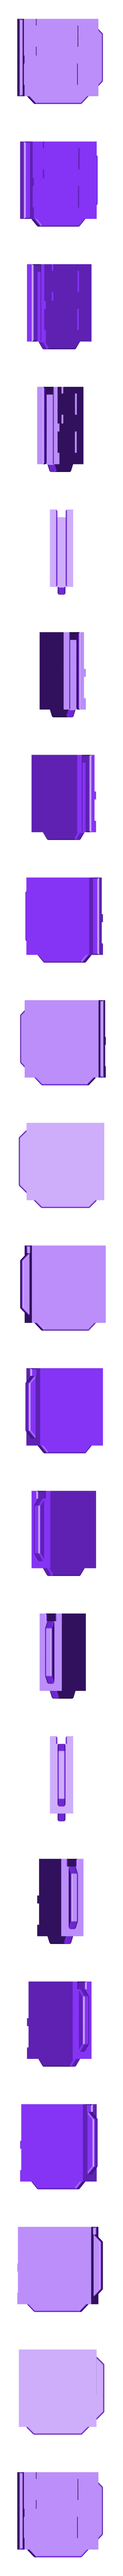 Piece - Part 21.stl Download free STL file Taquin CULTS / Sliding Puzzle • 3D print model, Valelab3D